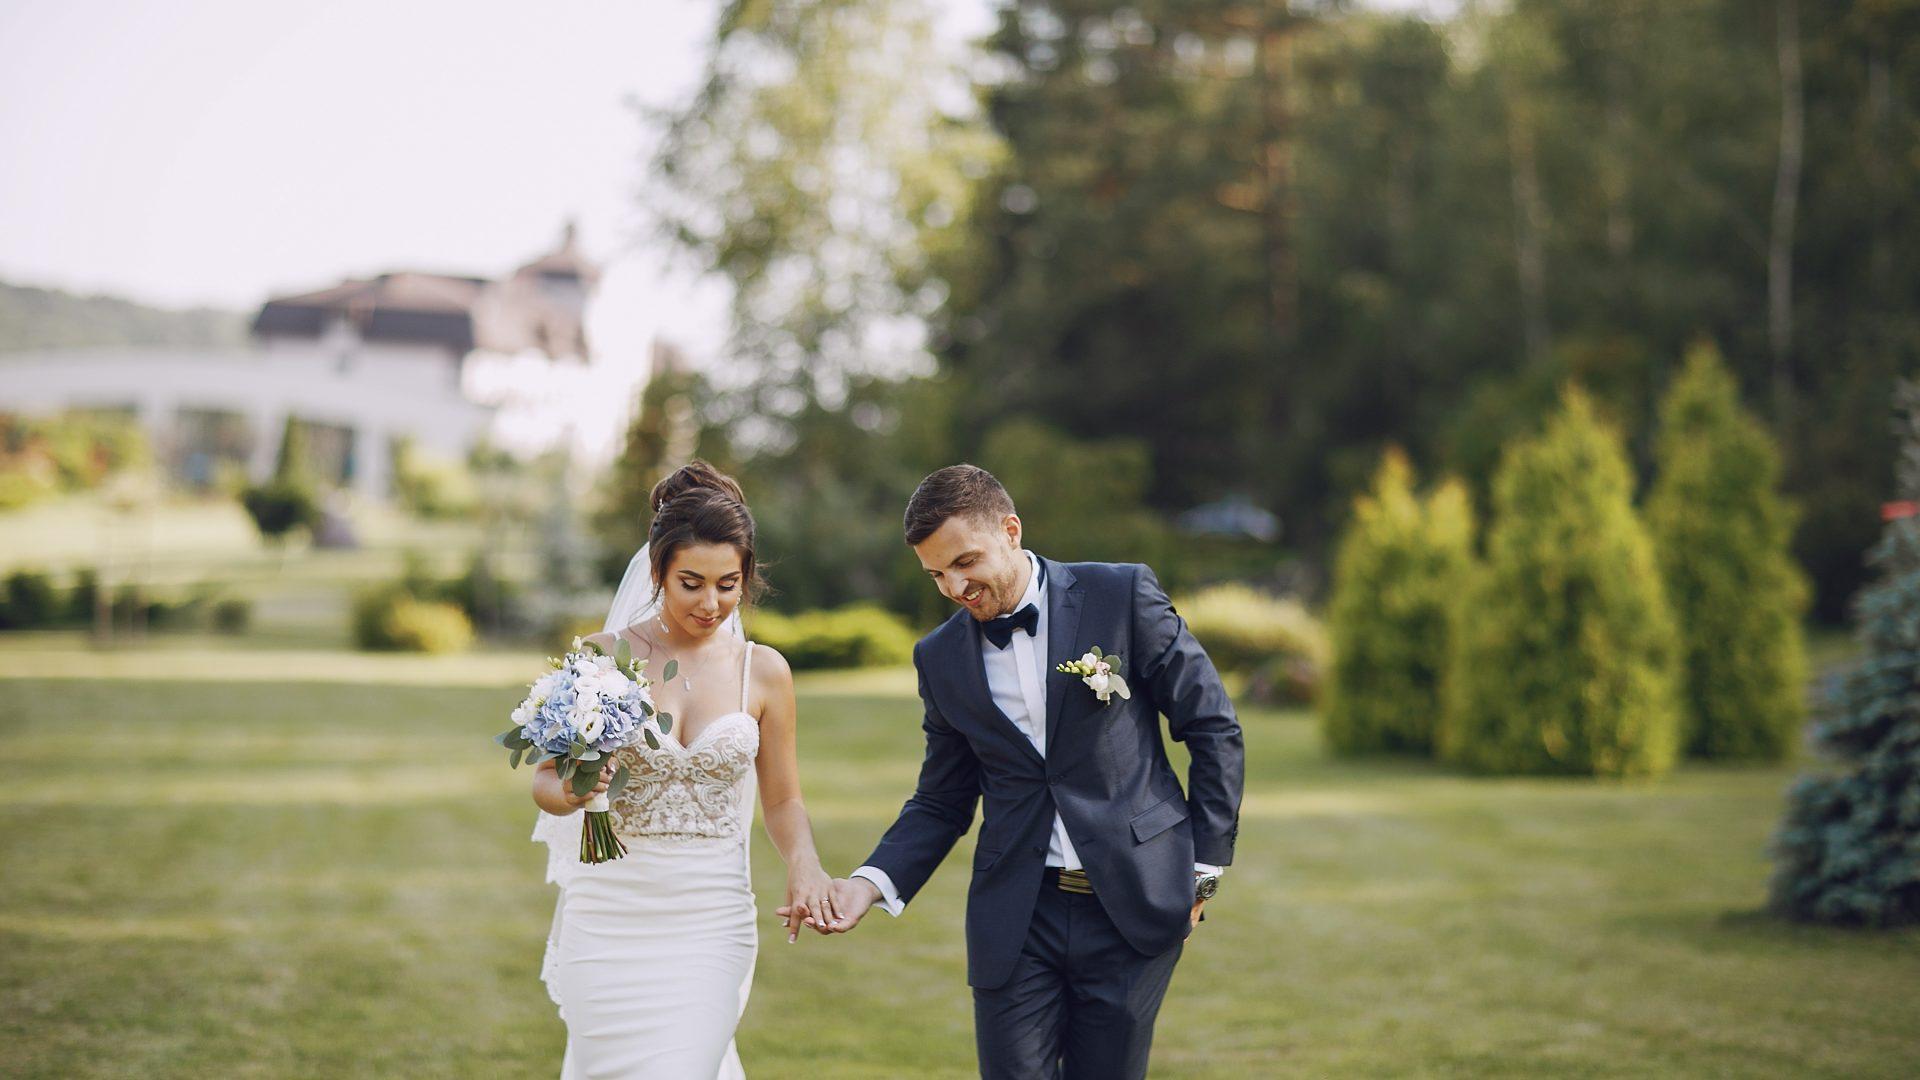 weddin-couple-planning-